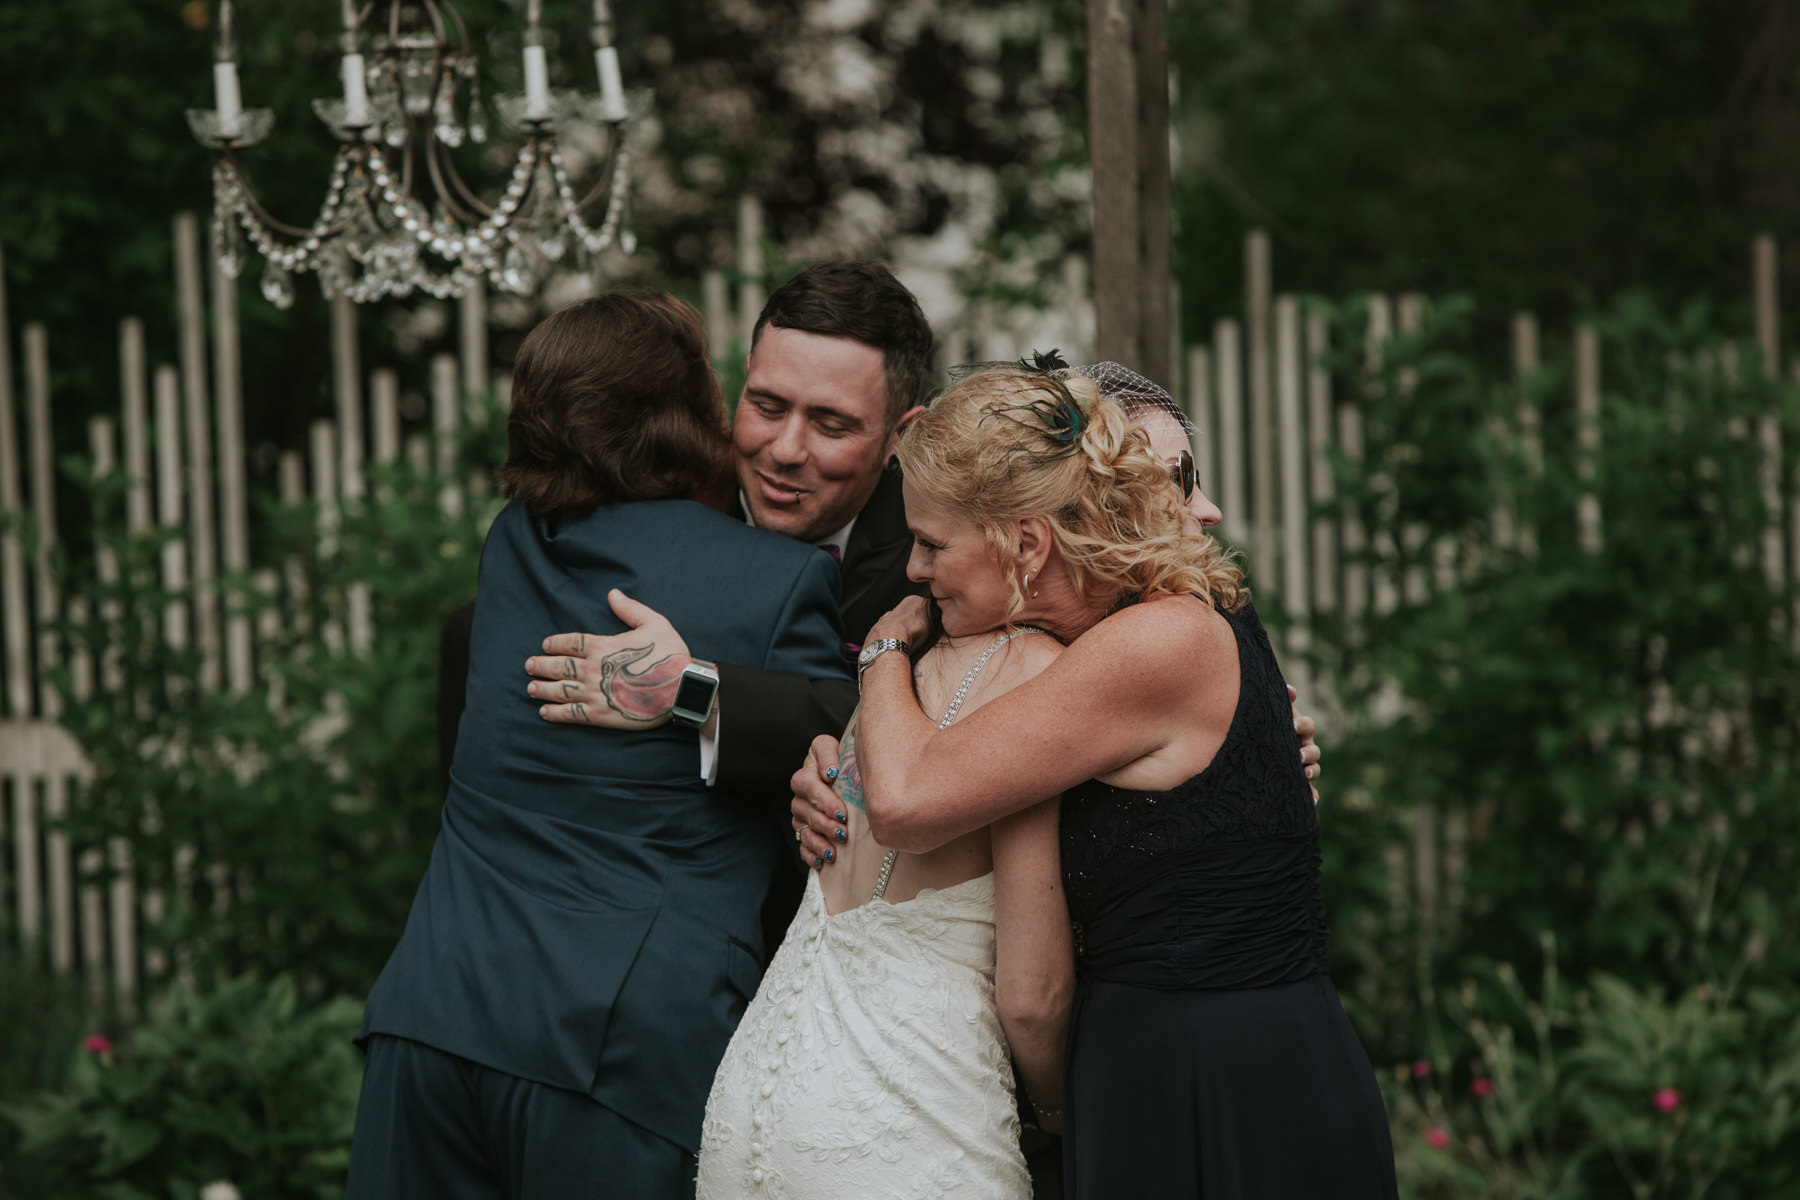 Vancouver Wedding Photographer Pam (25).jpg